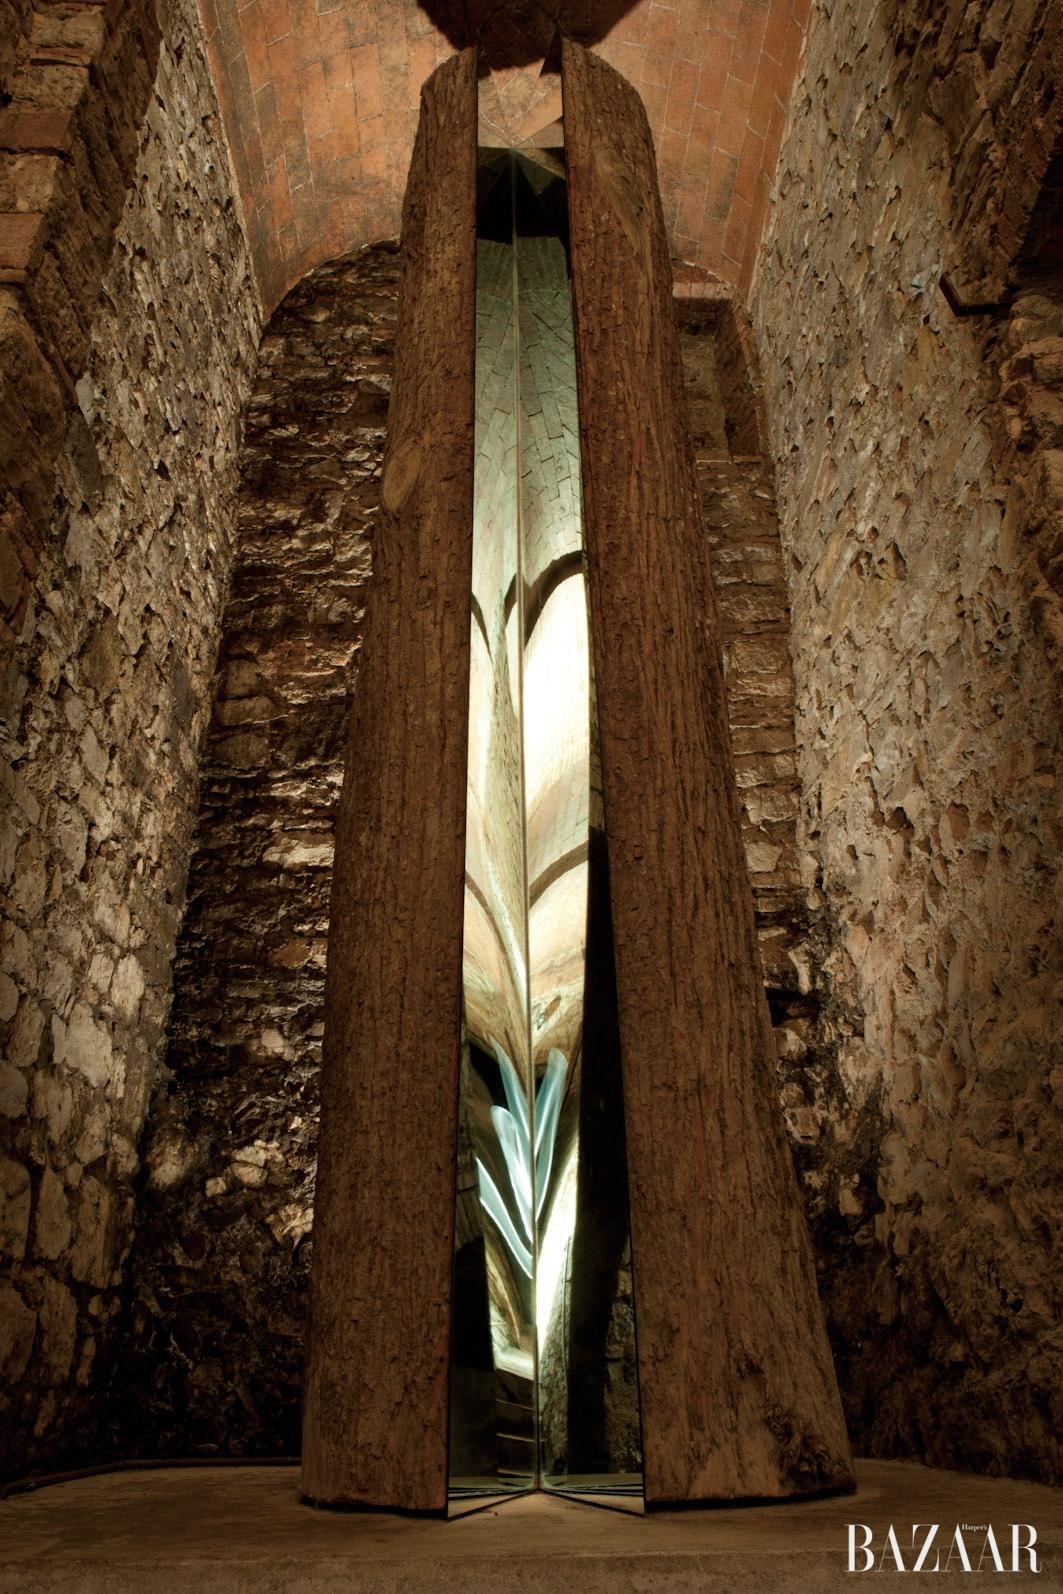 미켈란젤로 피스톨레토, 'L'albero di Ama. Divisione e Moltiplicazione Dello Specchio', 2000